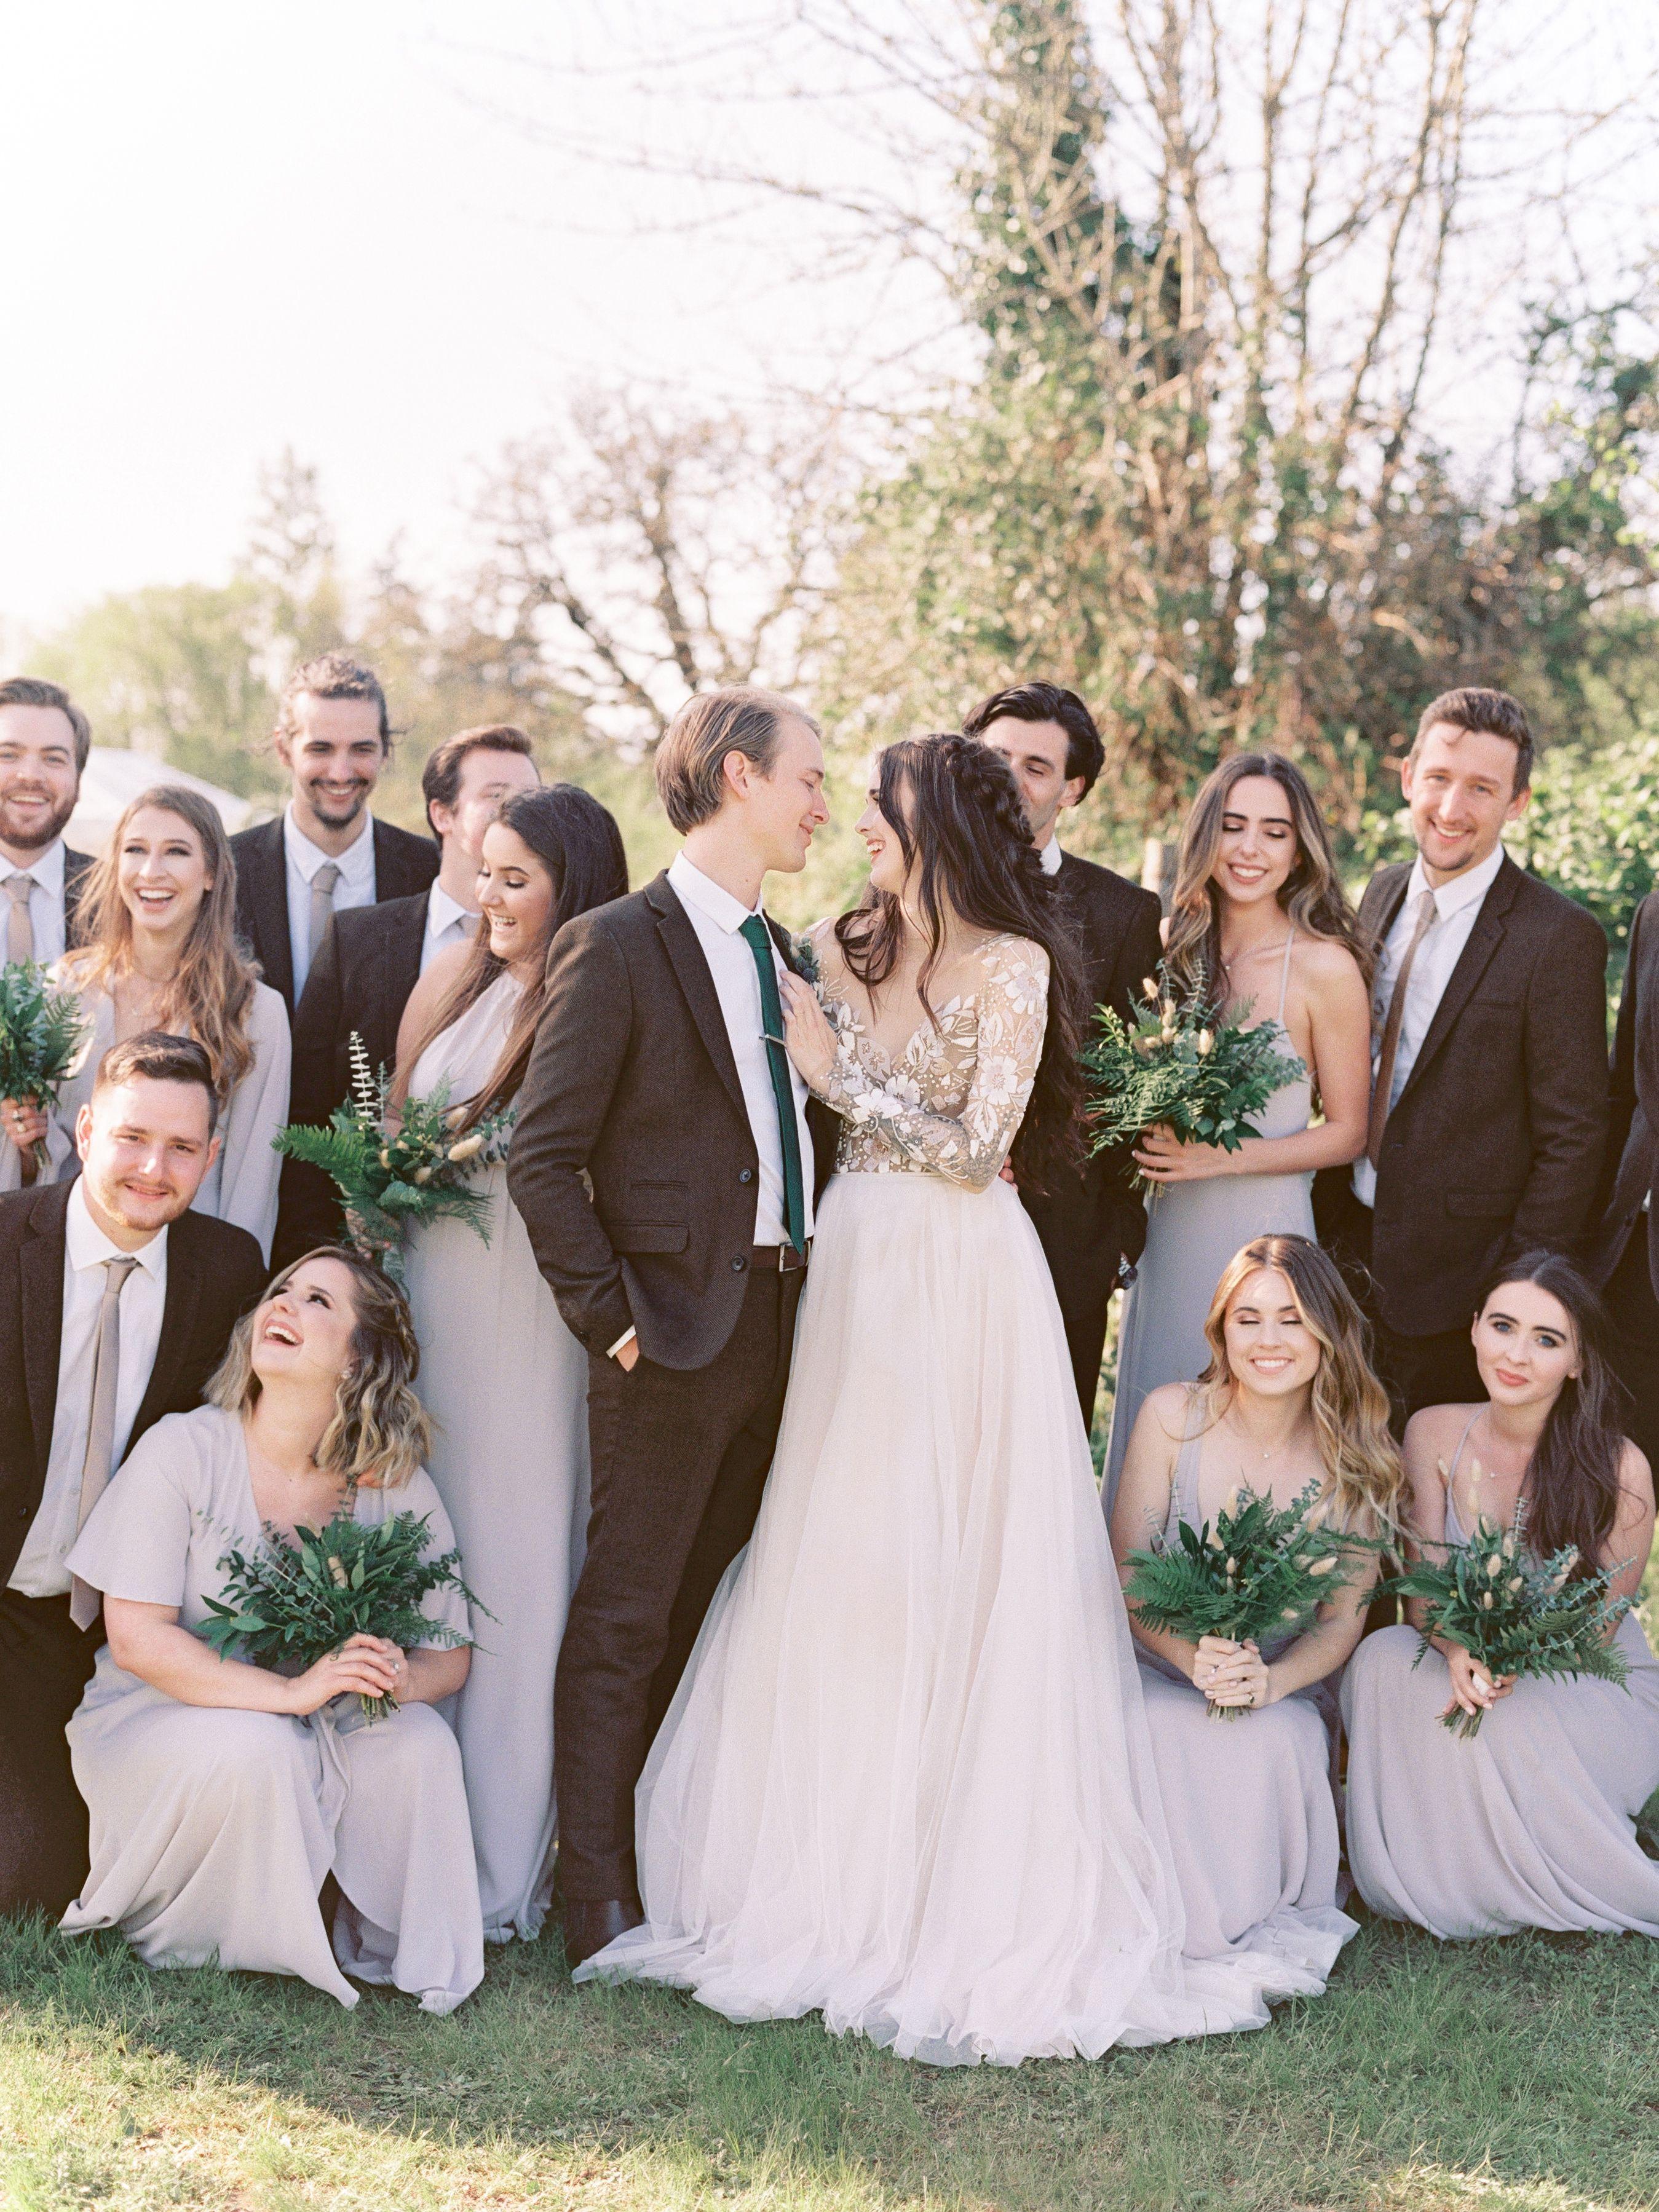 Dress by hayley paige oregon wedding photo by avamariaphoto